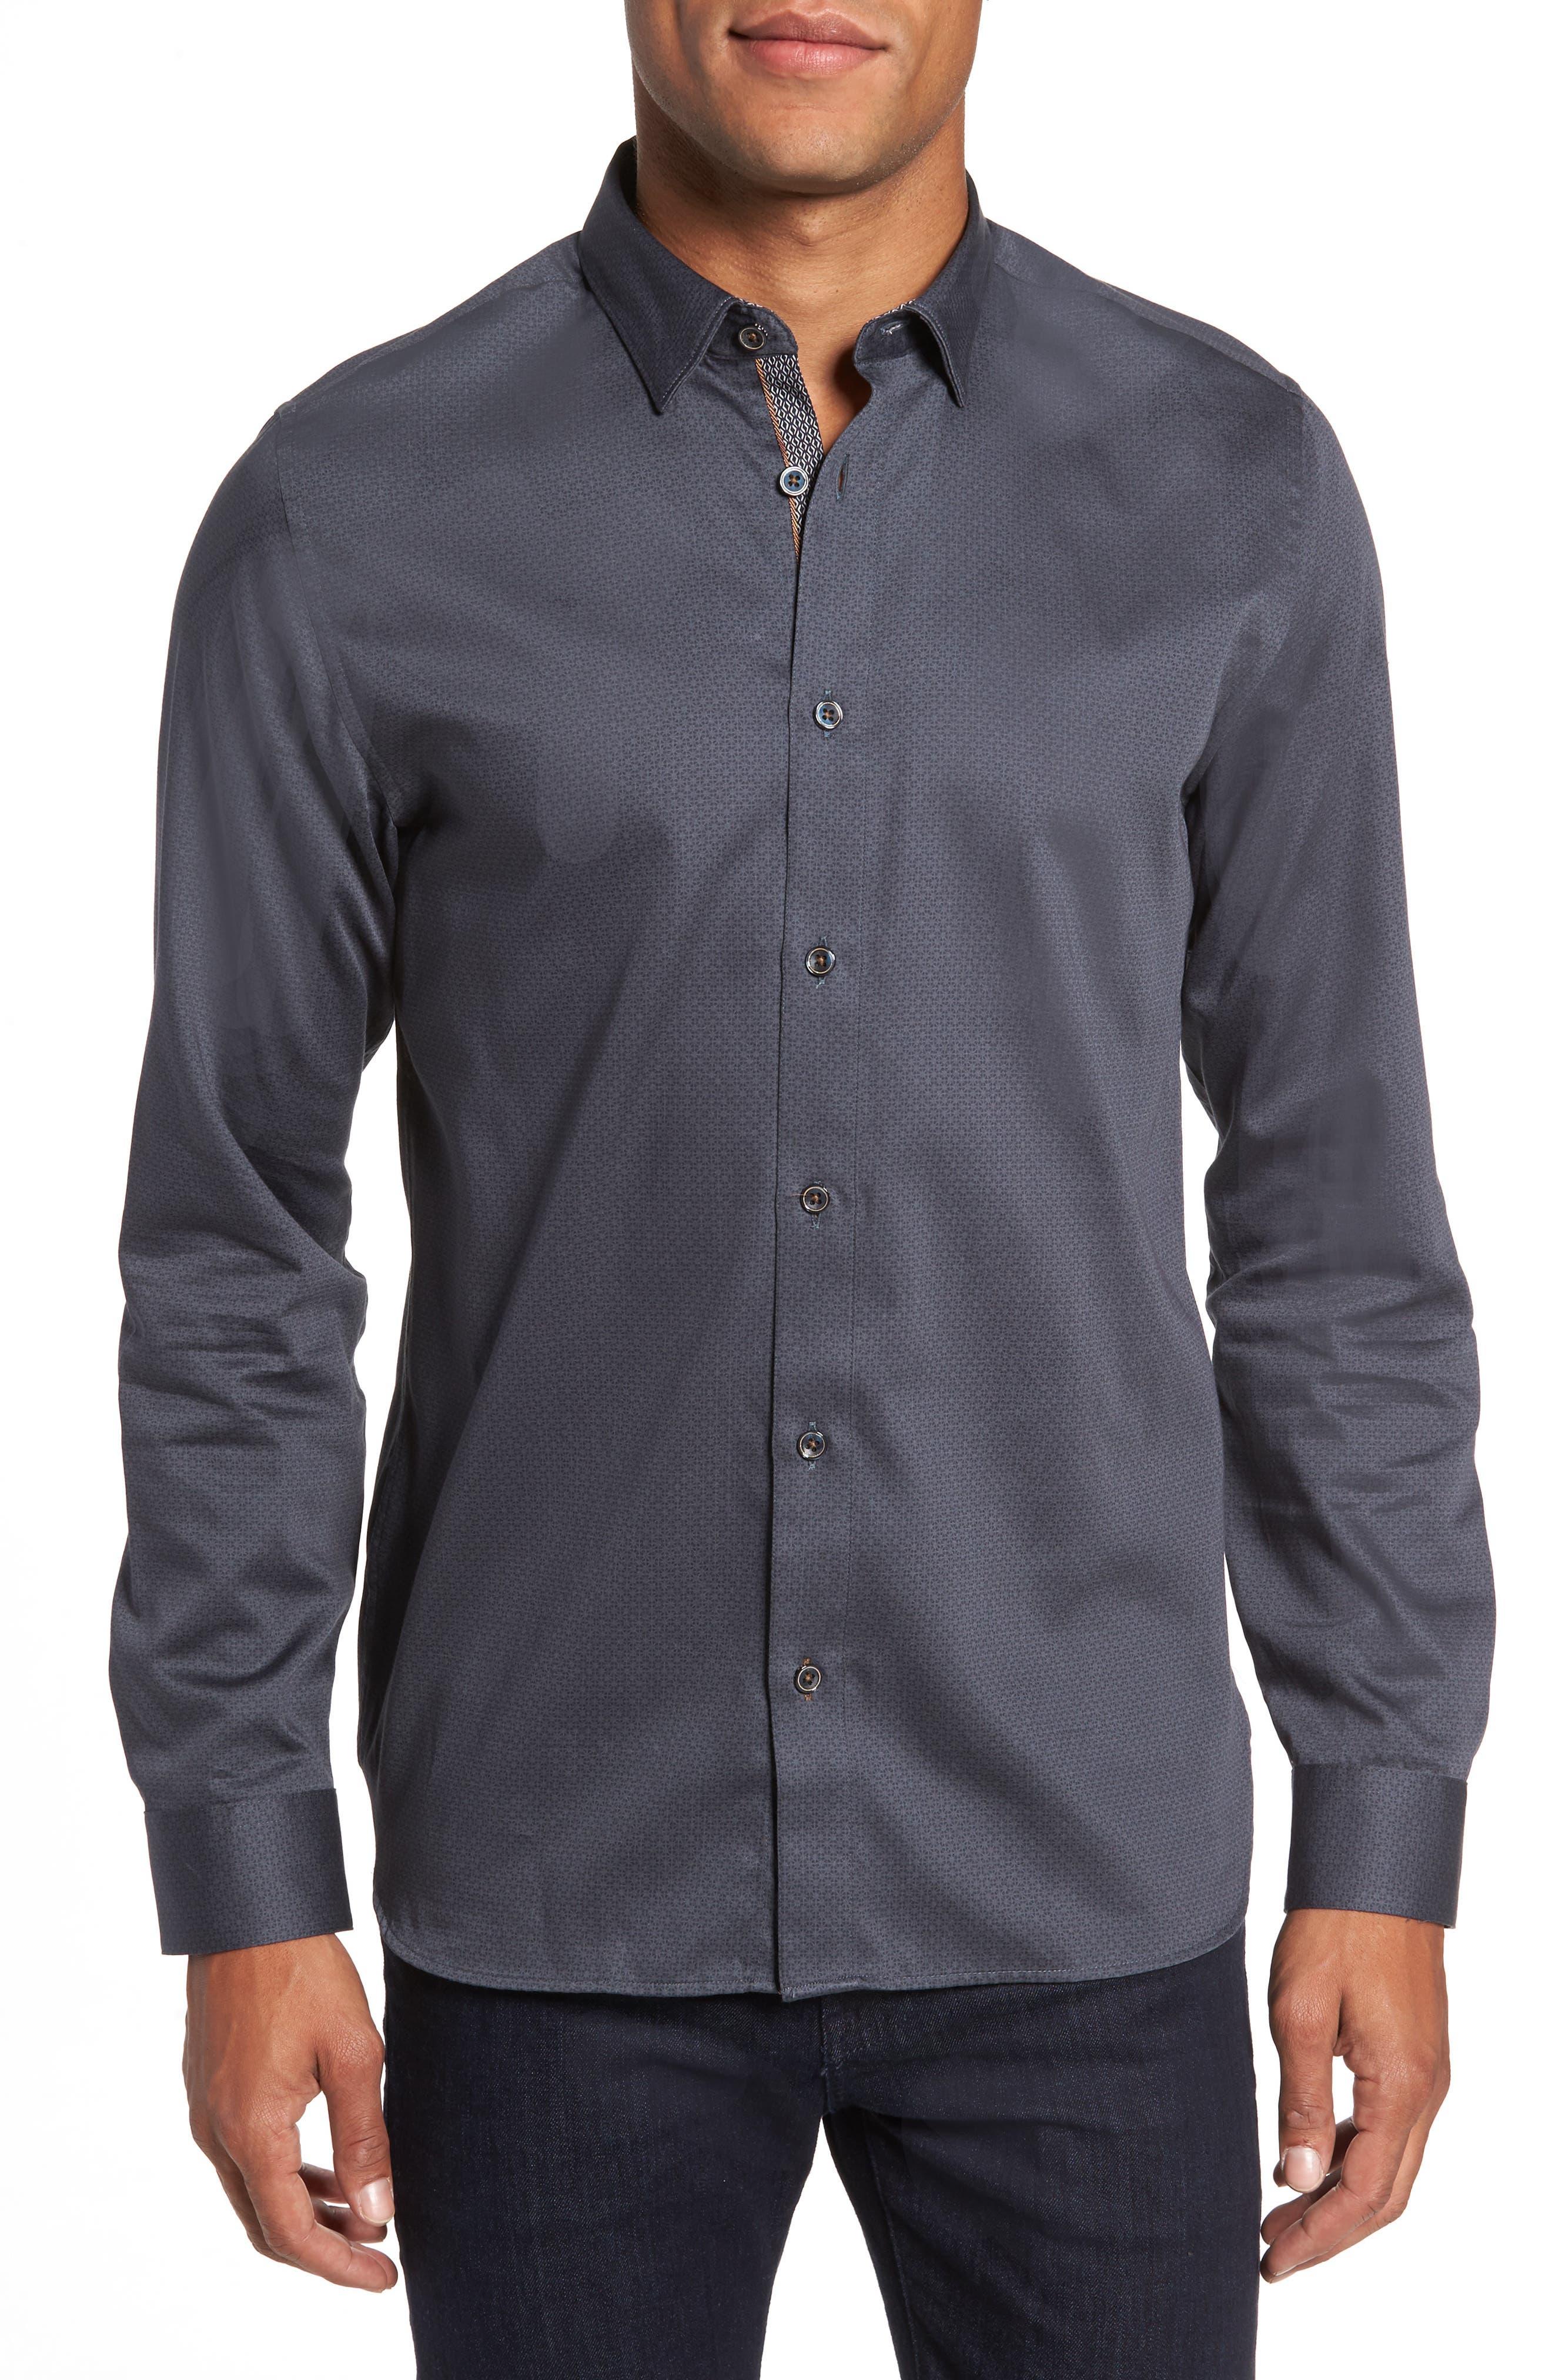 Strazbo Tonal Print Sport Shirt,                         Main,                         color, 030